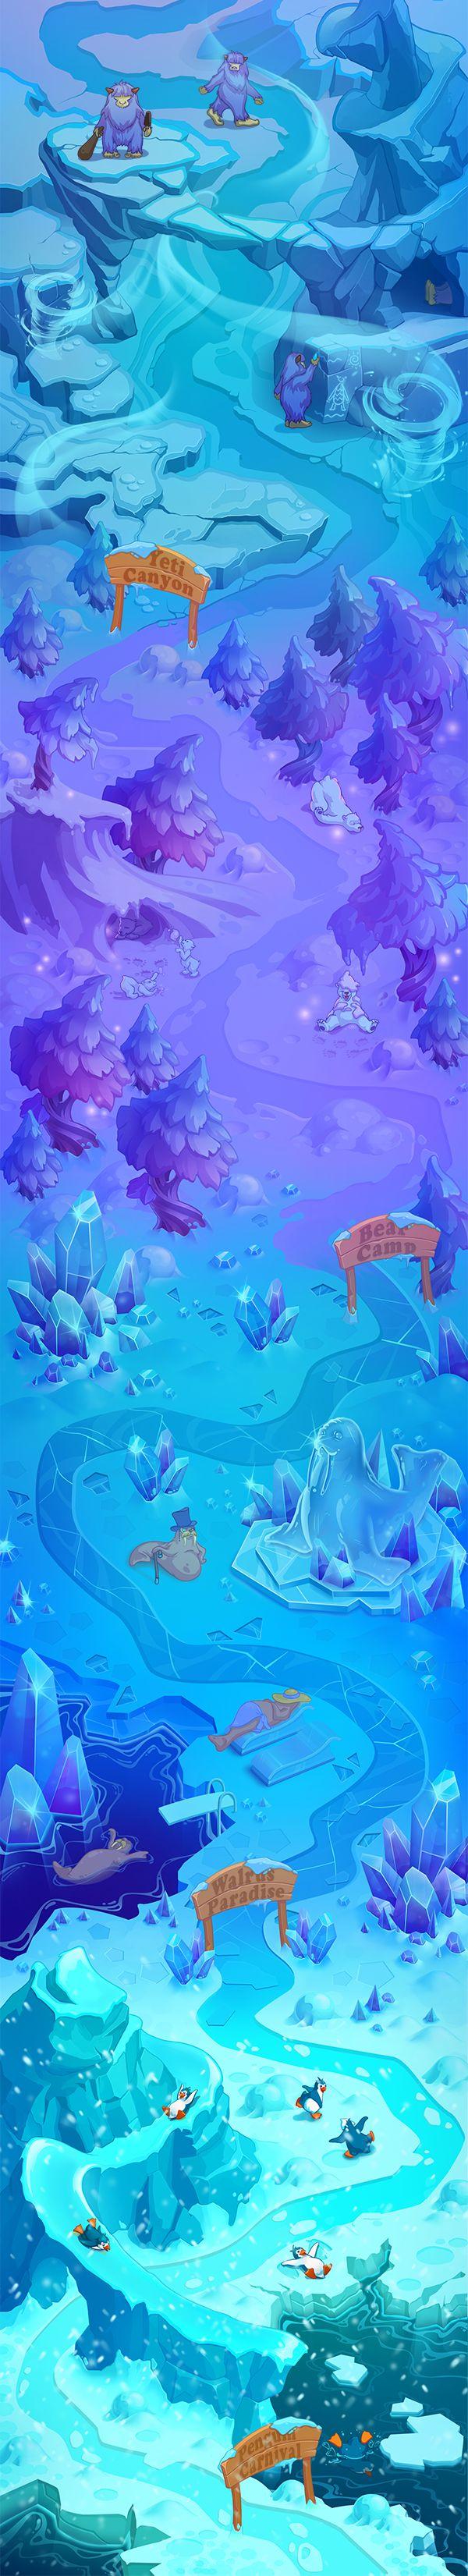 IceWorld map on Behance